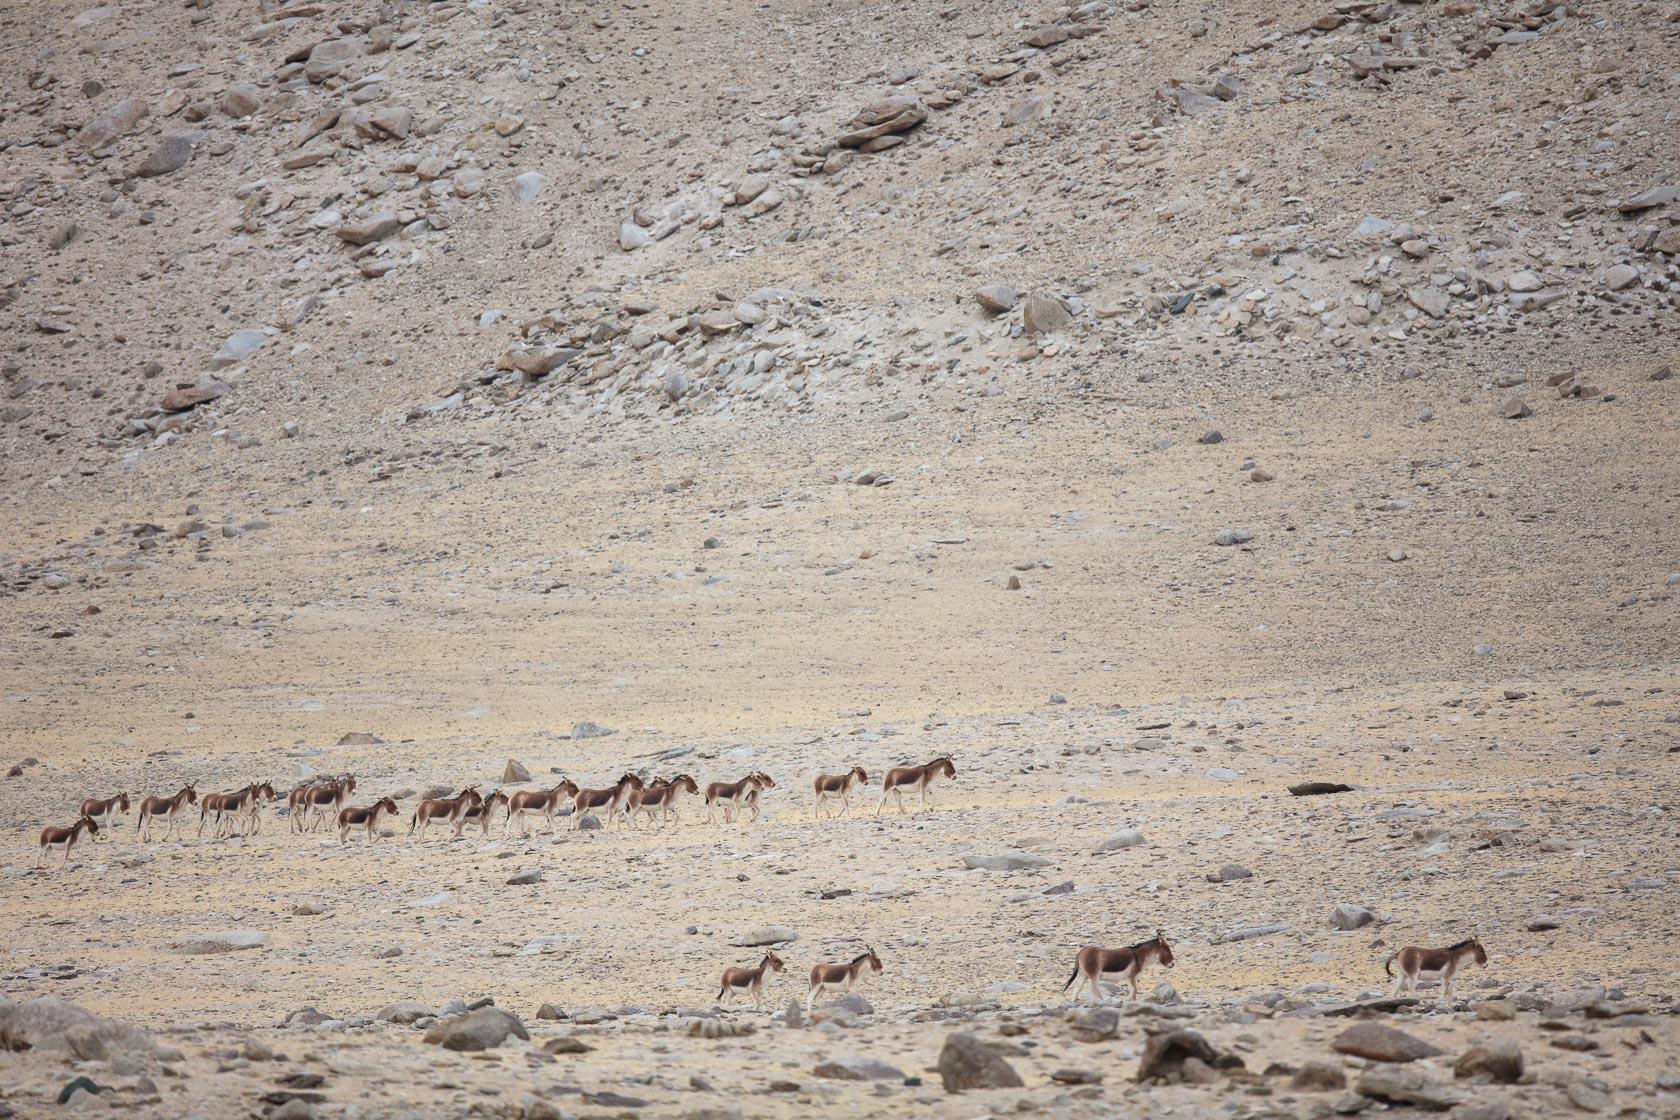 troupeau de kiangs (Equus kiang) près du Tso Kar au Ladakh